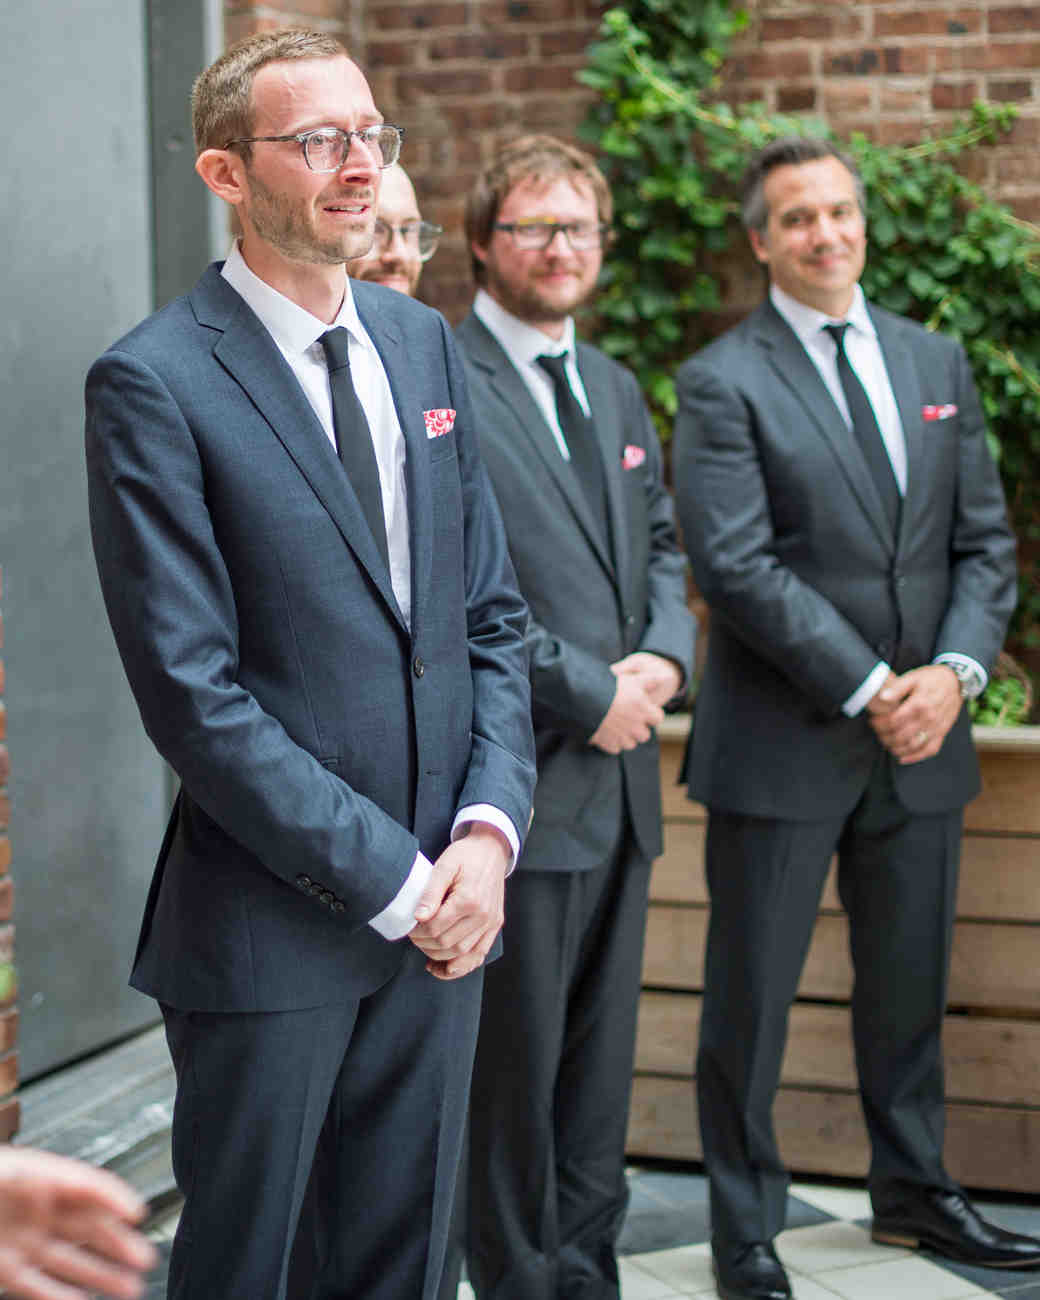 caitlin-michael-wedding-ceremony-303-s111835-0415.jpg